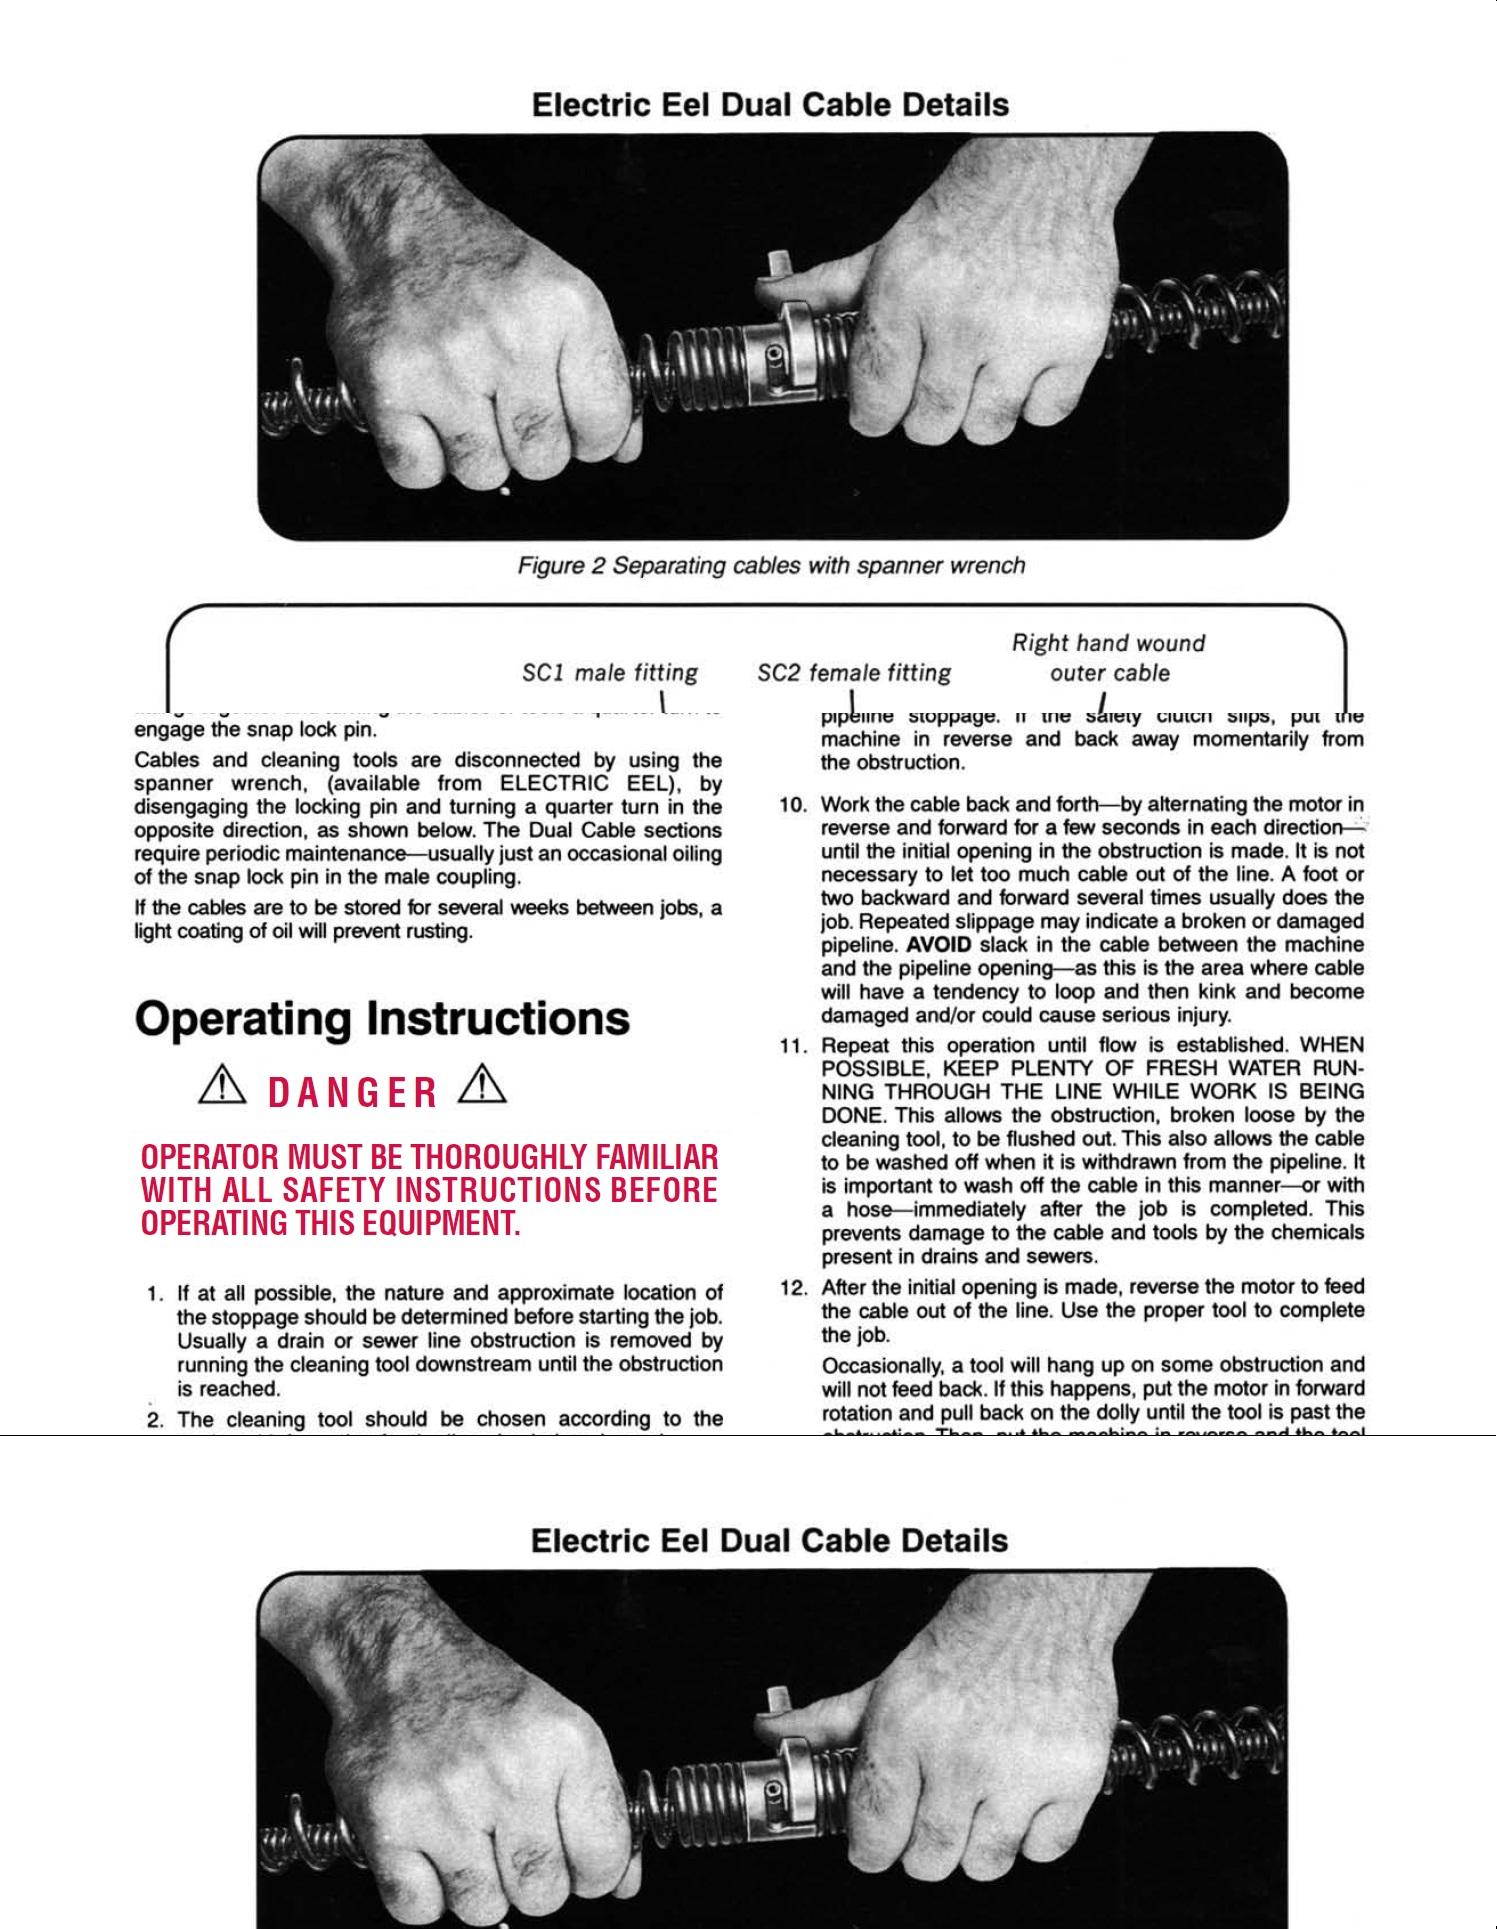 model-c-operating-manual-page-5.jpg